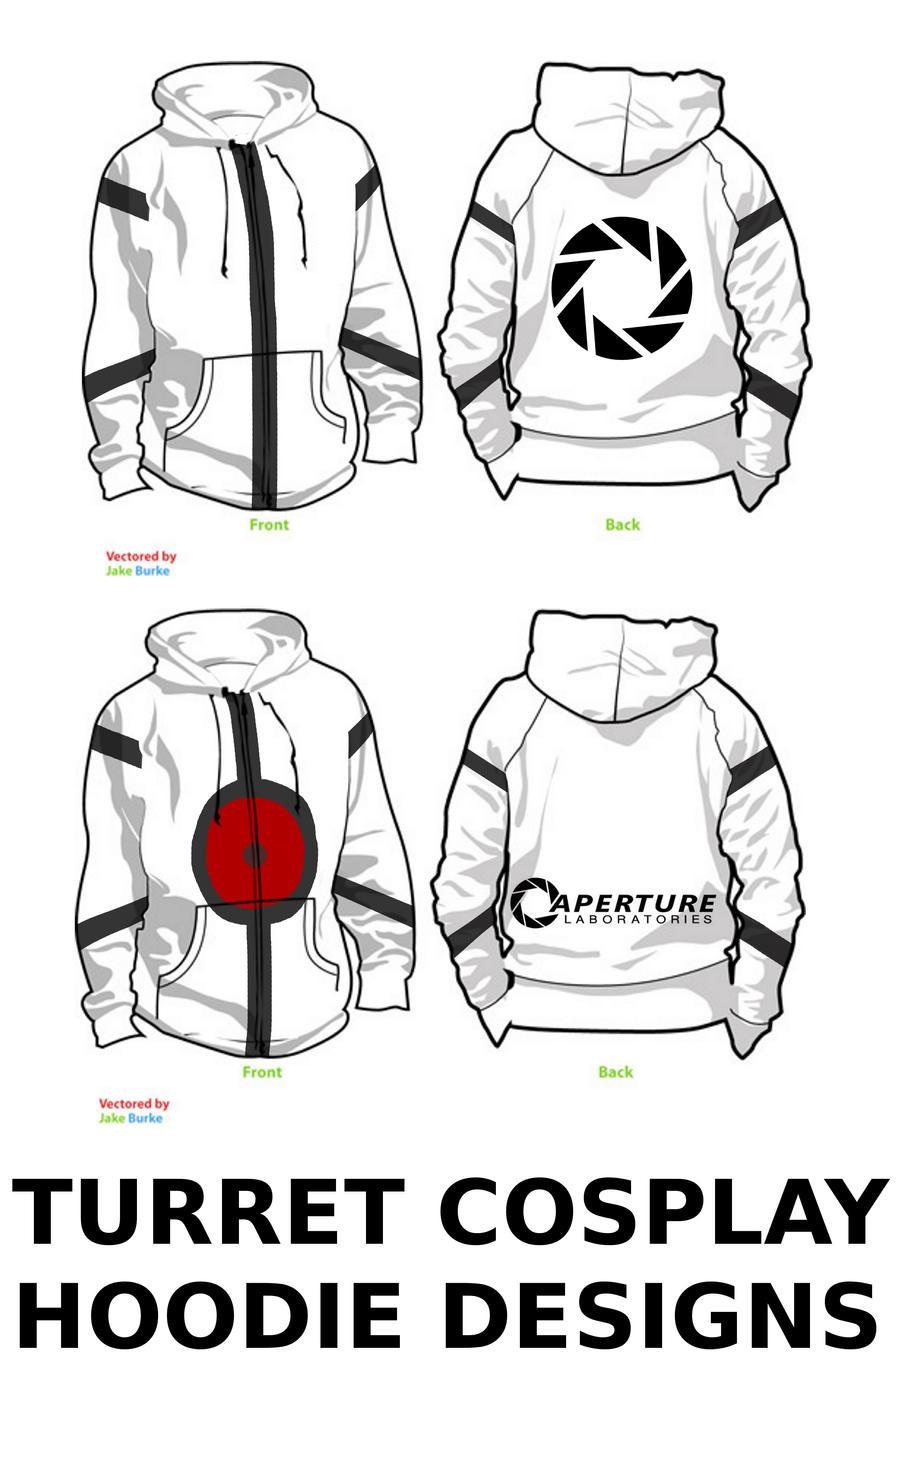 Turret cosplay hoodie designs by doodles4cash on DeviantArt